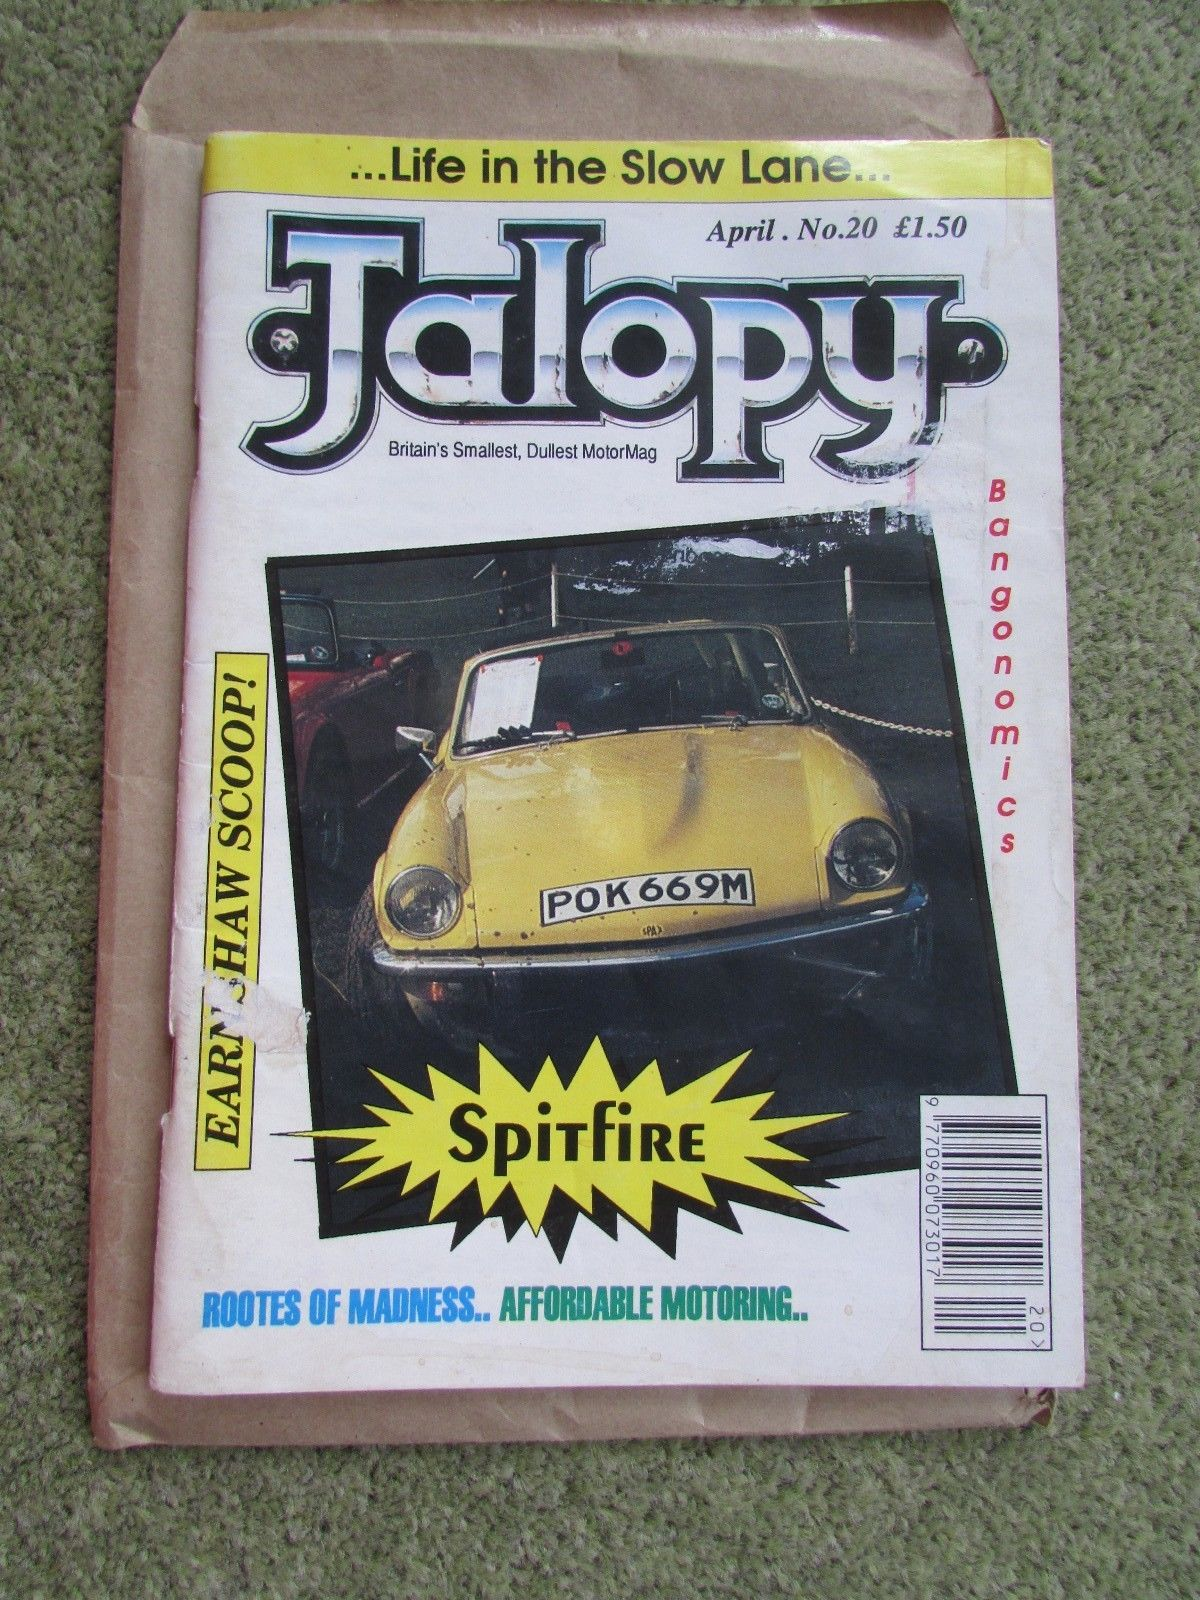 Jalopy no. 20 ebay June 18.jpg